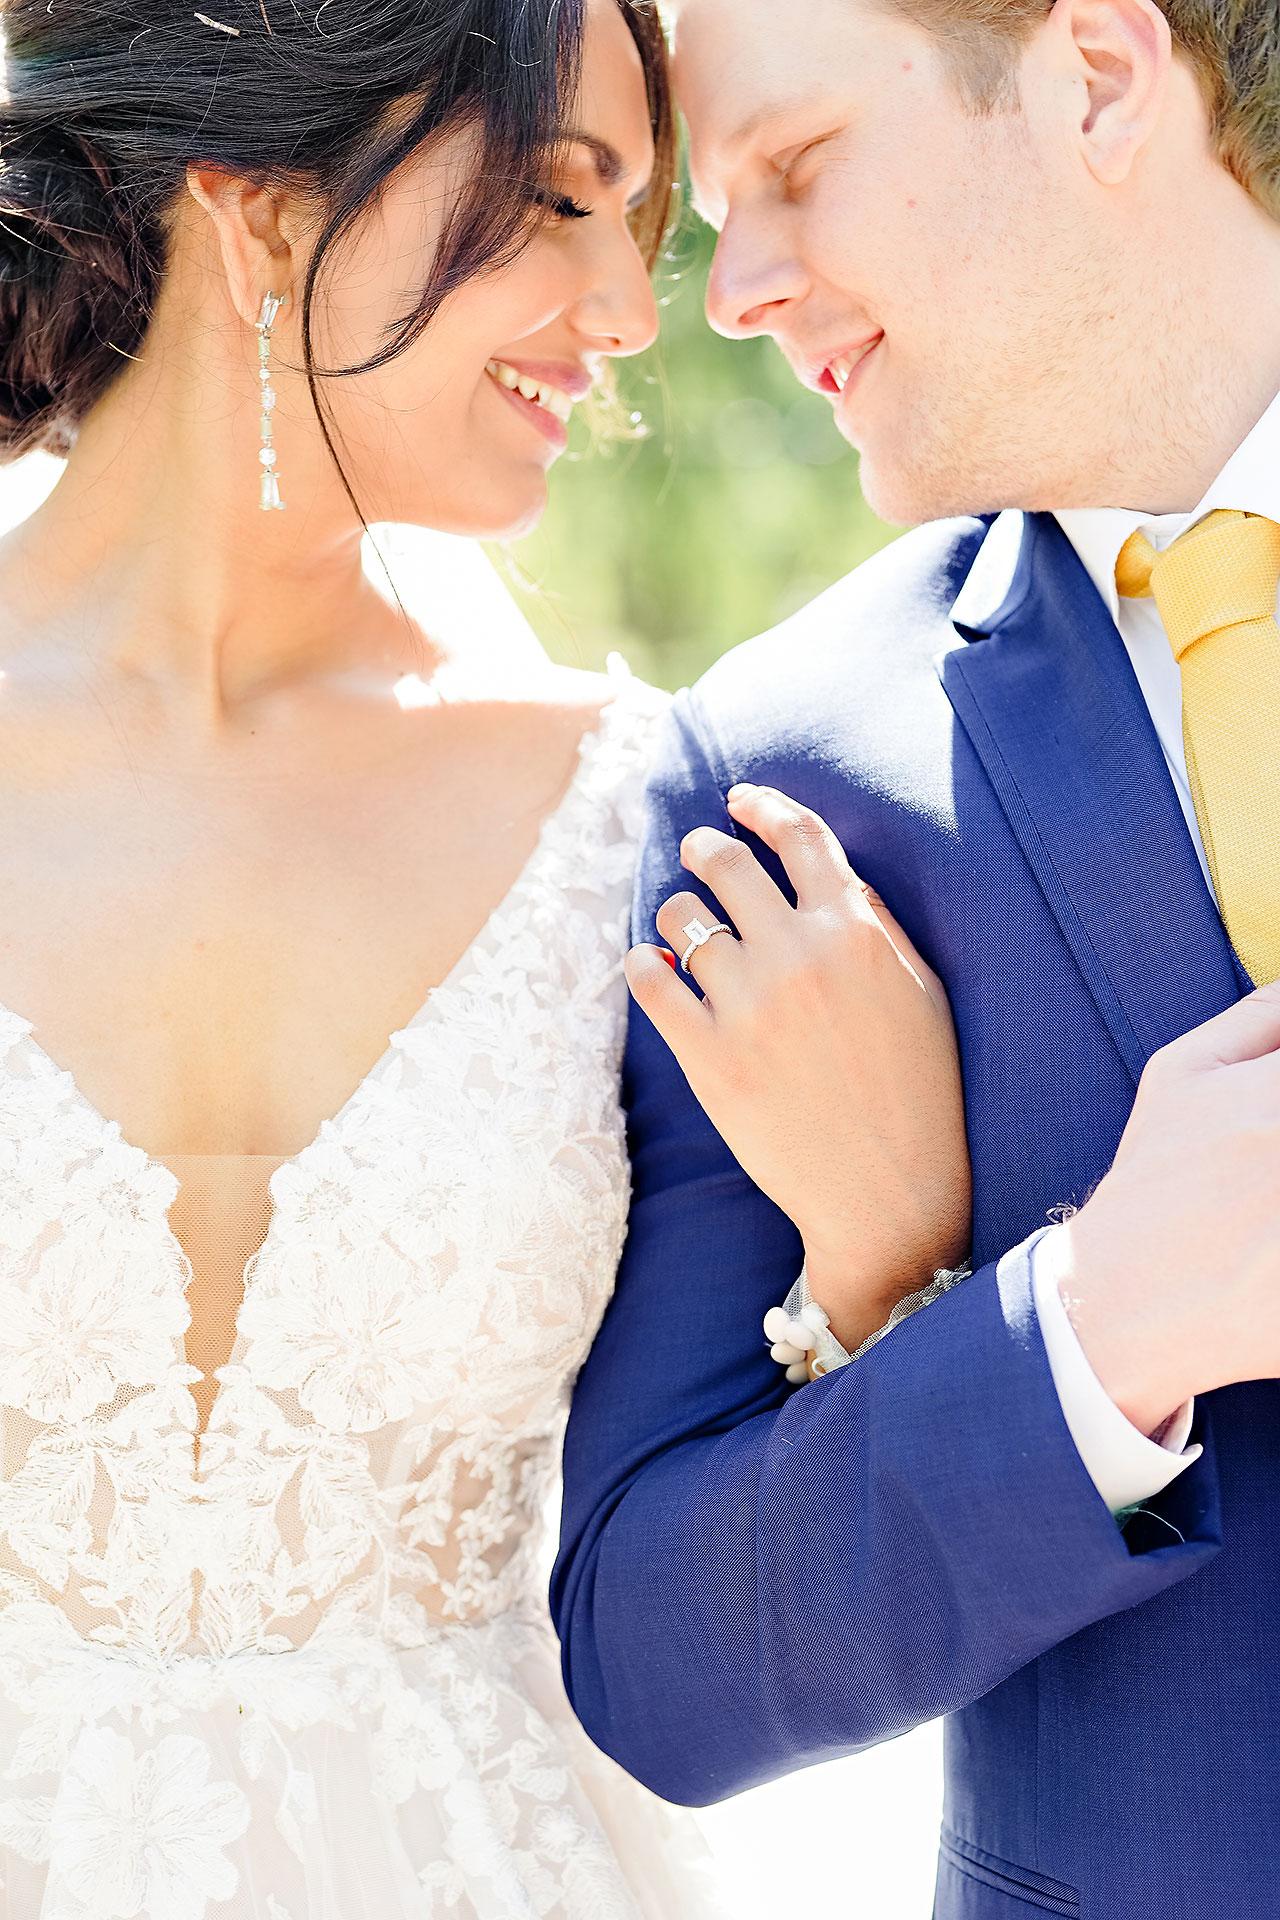 Nadia Parker Black Iris Estate Carmel Indiana Wedding May 2021 086